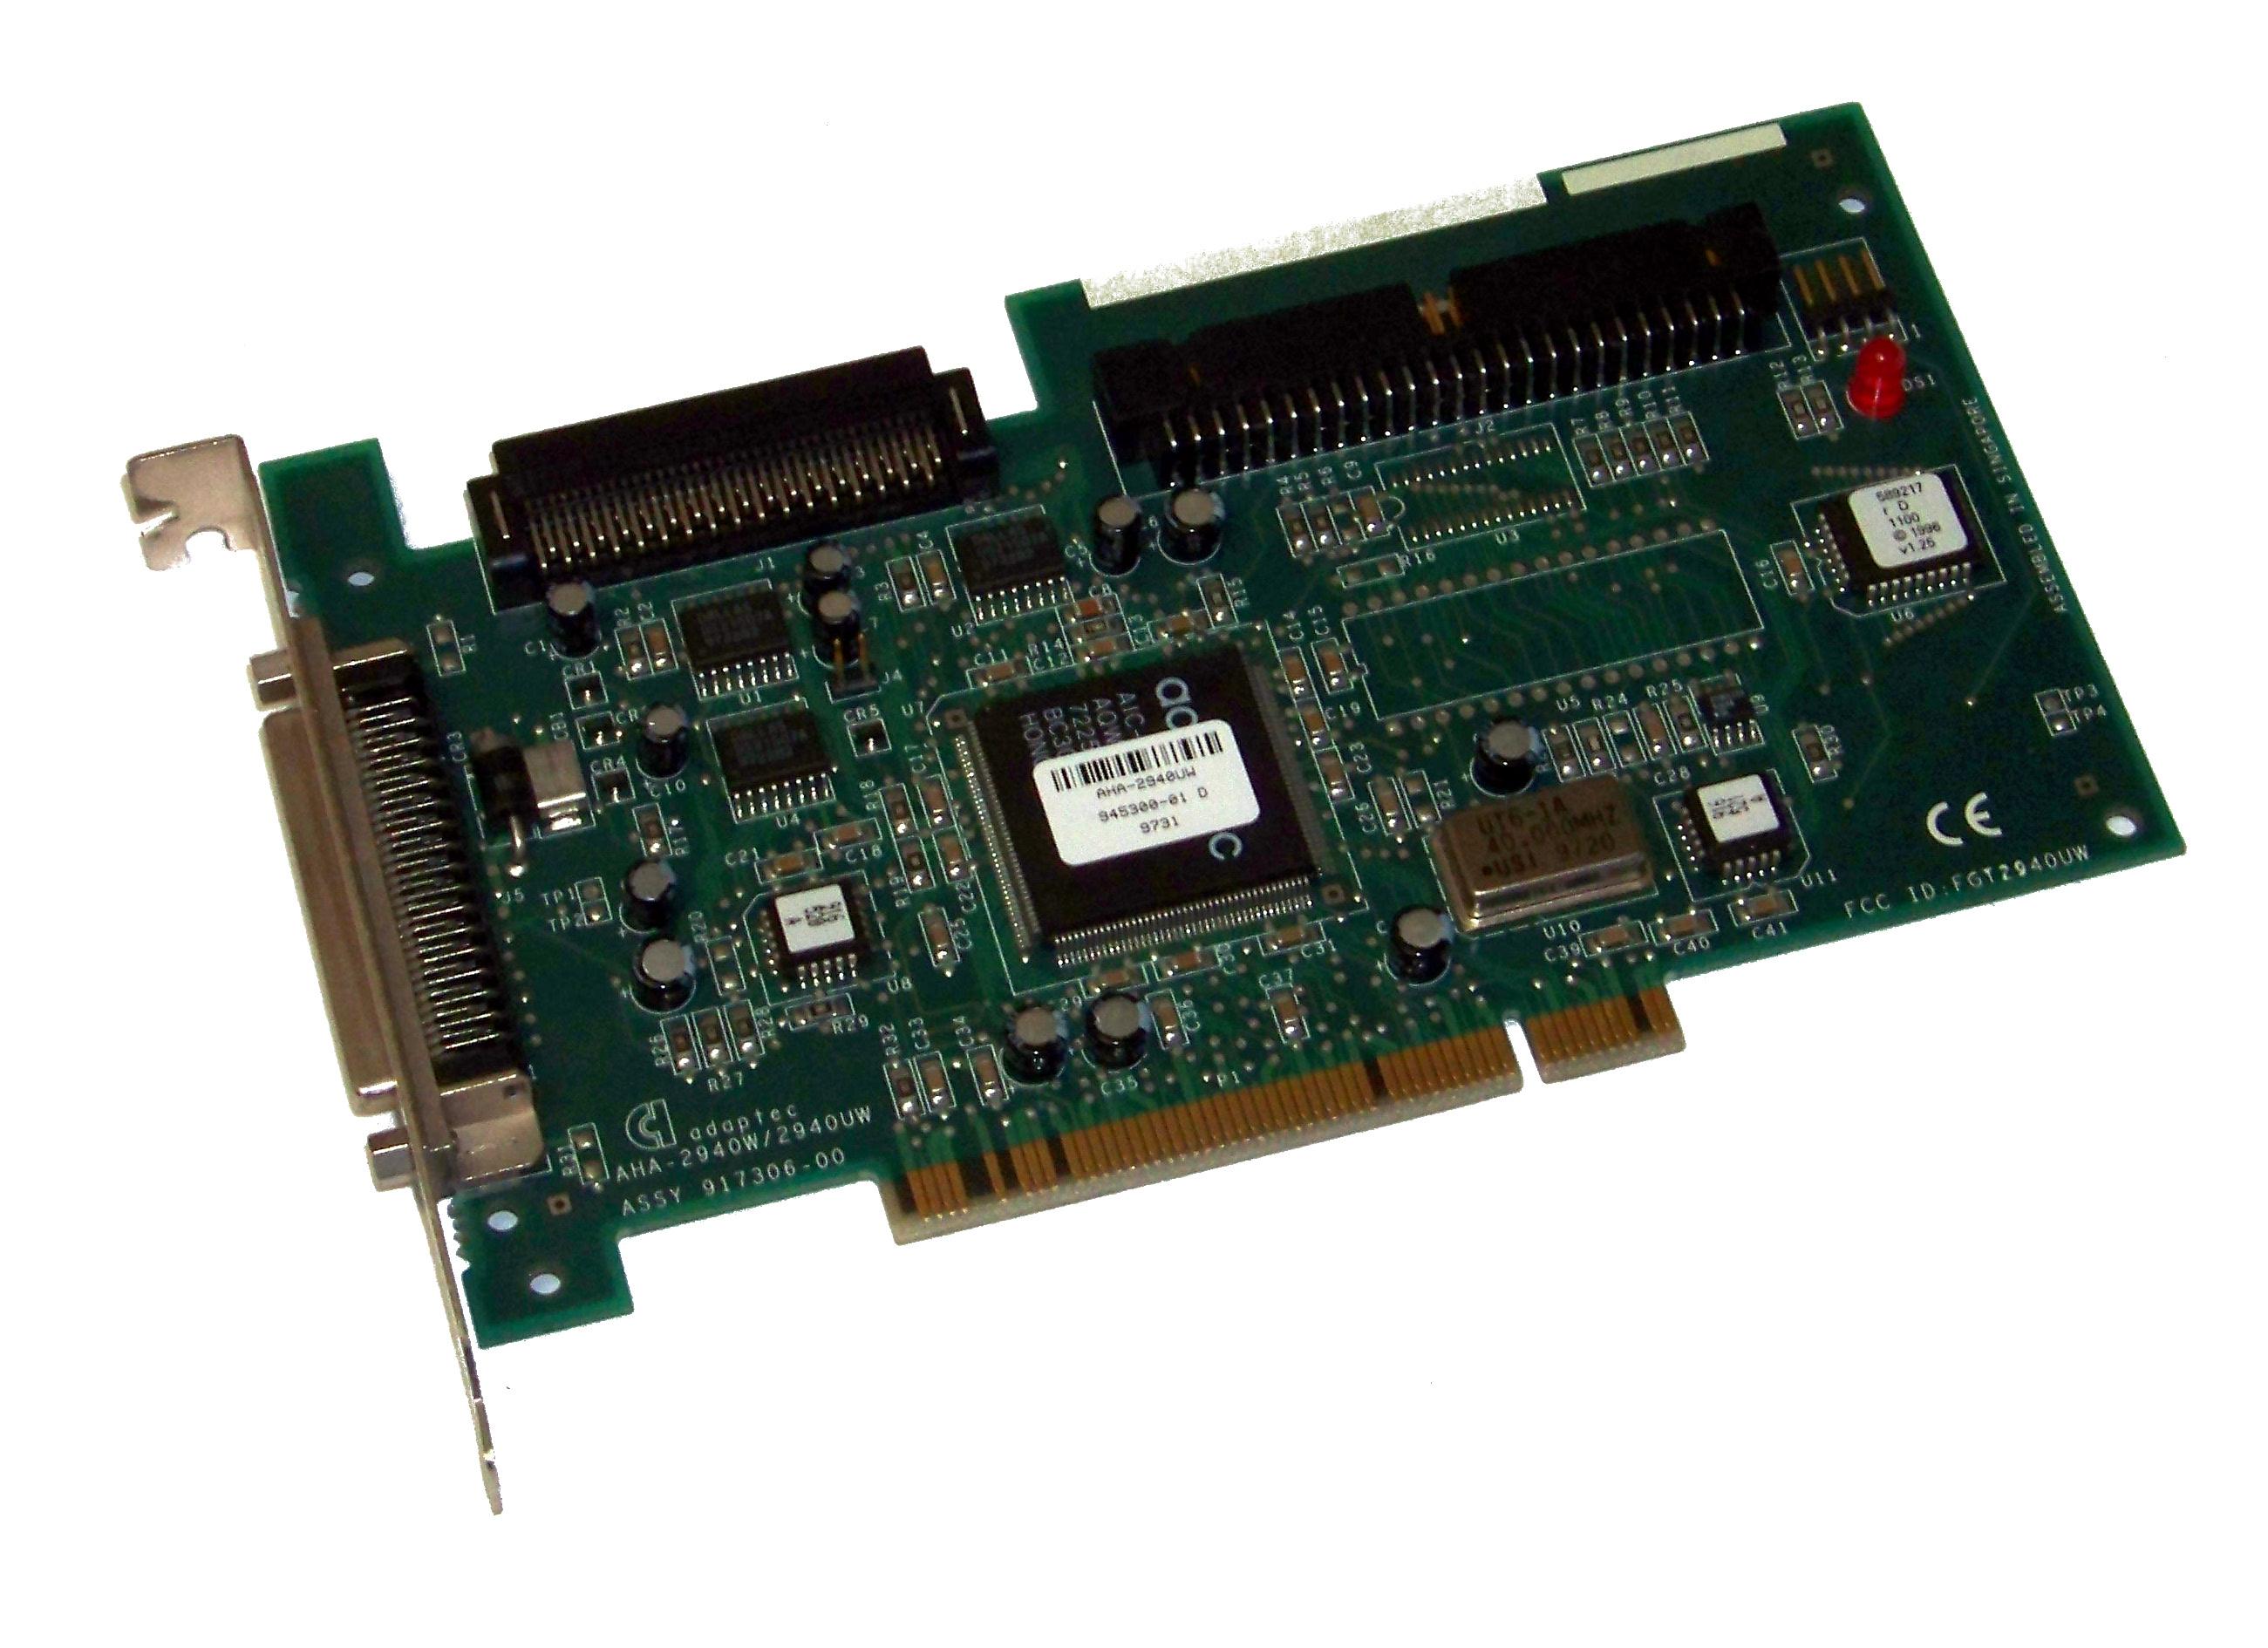 ADAPTEC AIC-788X PCI SCSI CONTROLLER WINDOWS 8 DRIVER DOWNLOAD